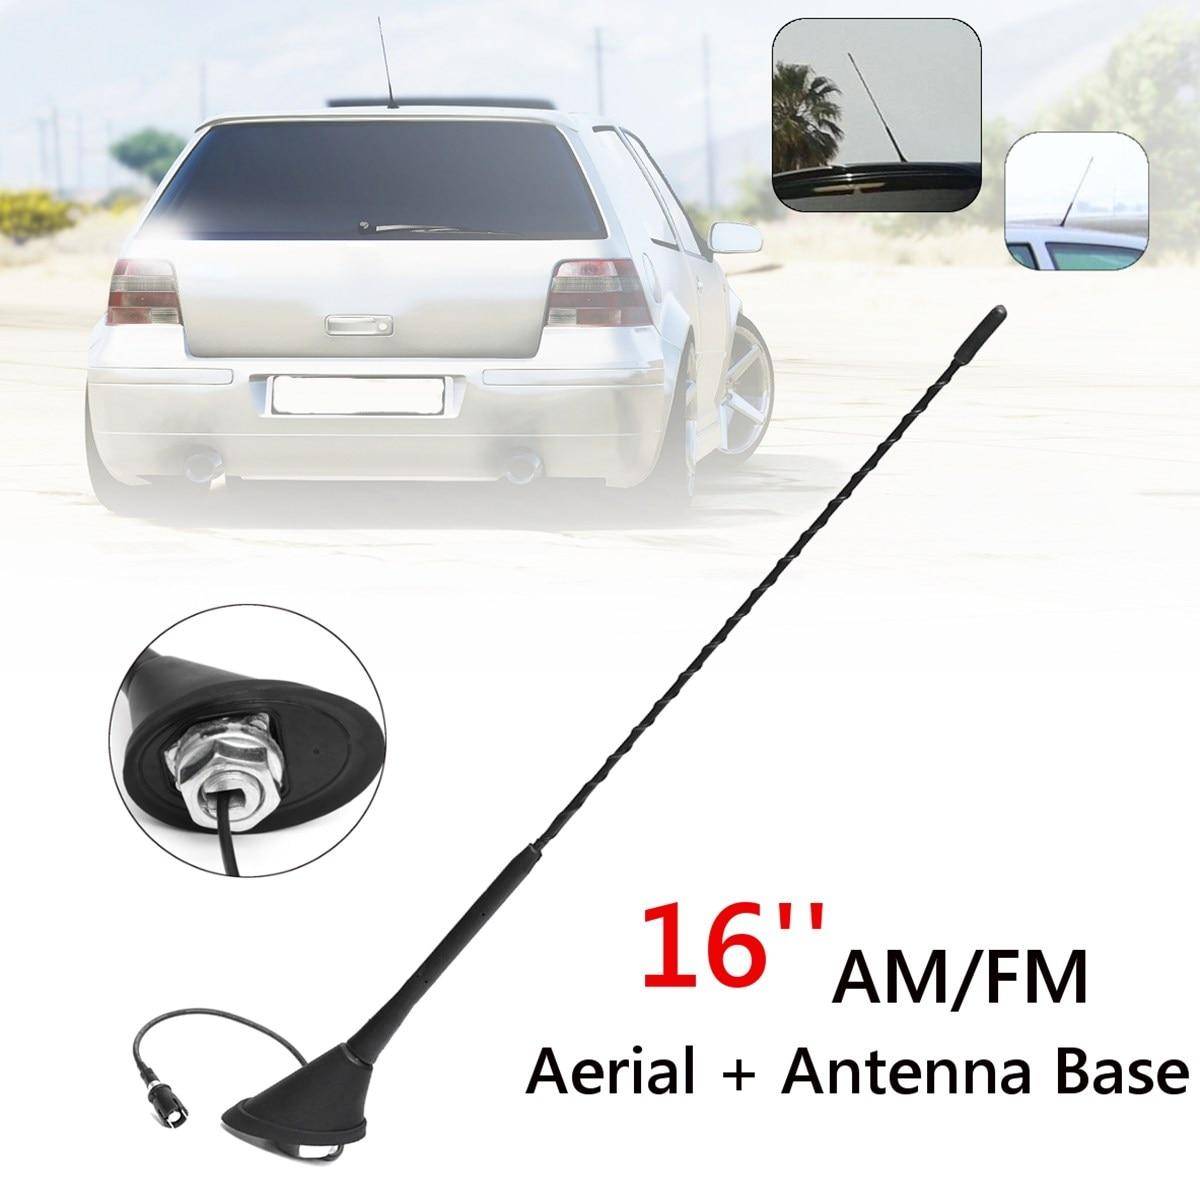 16 inch Universal AM/FM Aerial Antenna Roof Mast Base For VW/Volkswagen/Skoda/Audi/Golf/Passat/Jetta/Bora MK4 1994 1995 1996